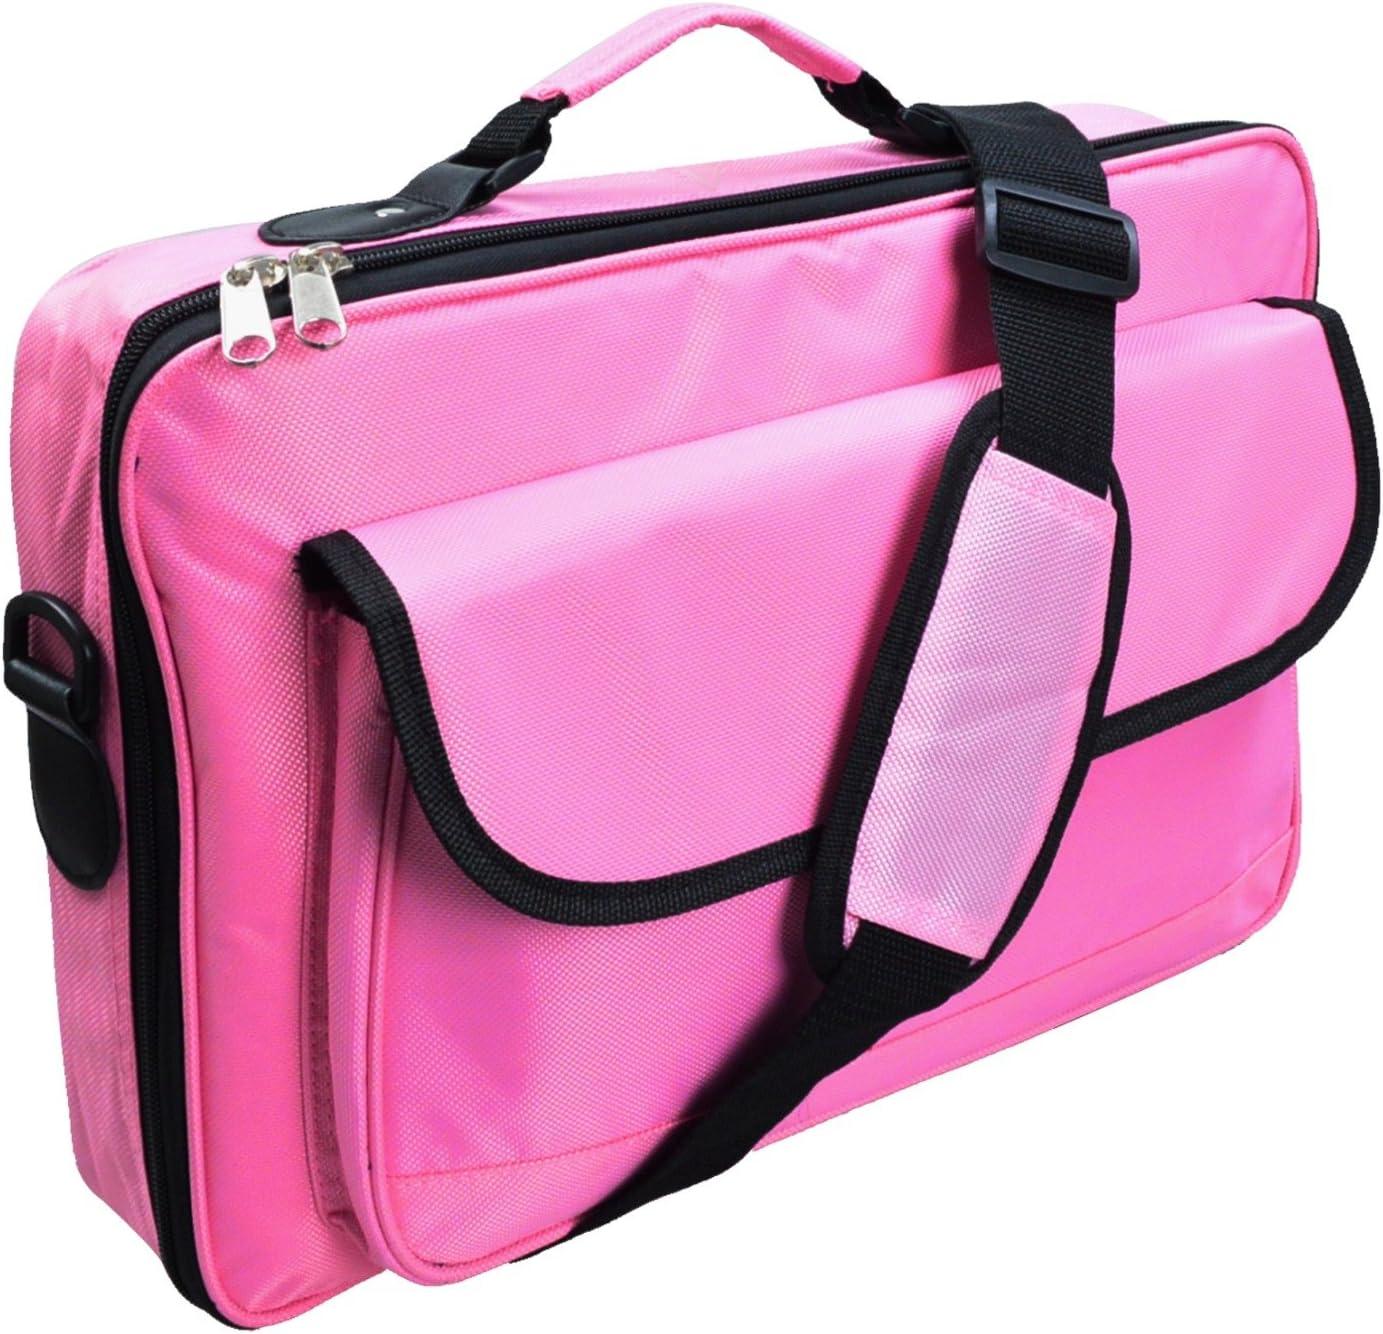 Cool Laptop Bag Floral Love Word Pink Cat 3D Print Laptop Computer Sleeves Slim Neoprene Laptop Sleeves for Teen Students White 13inch